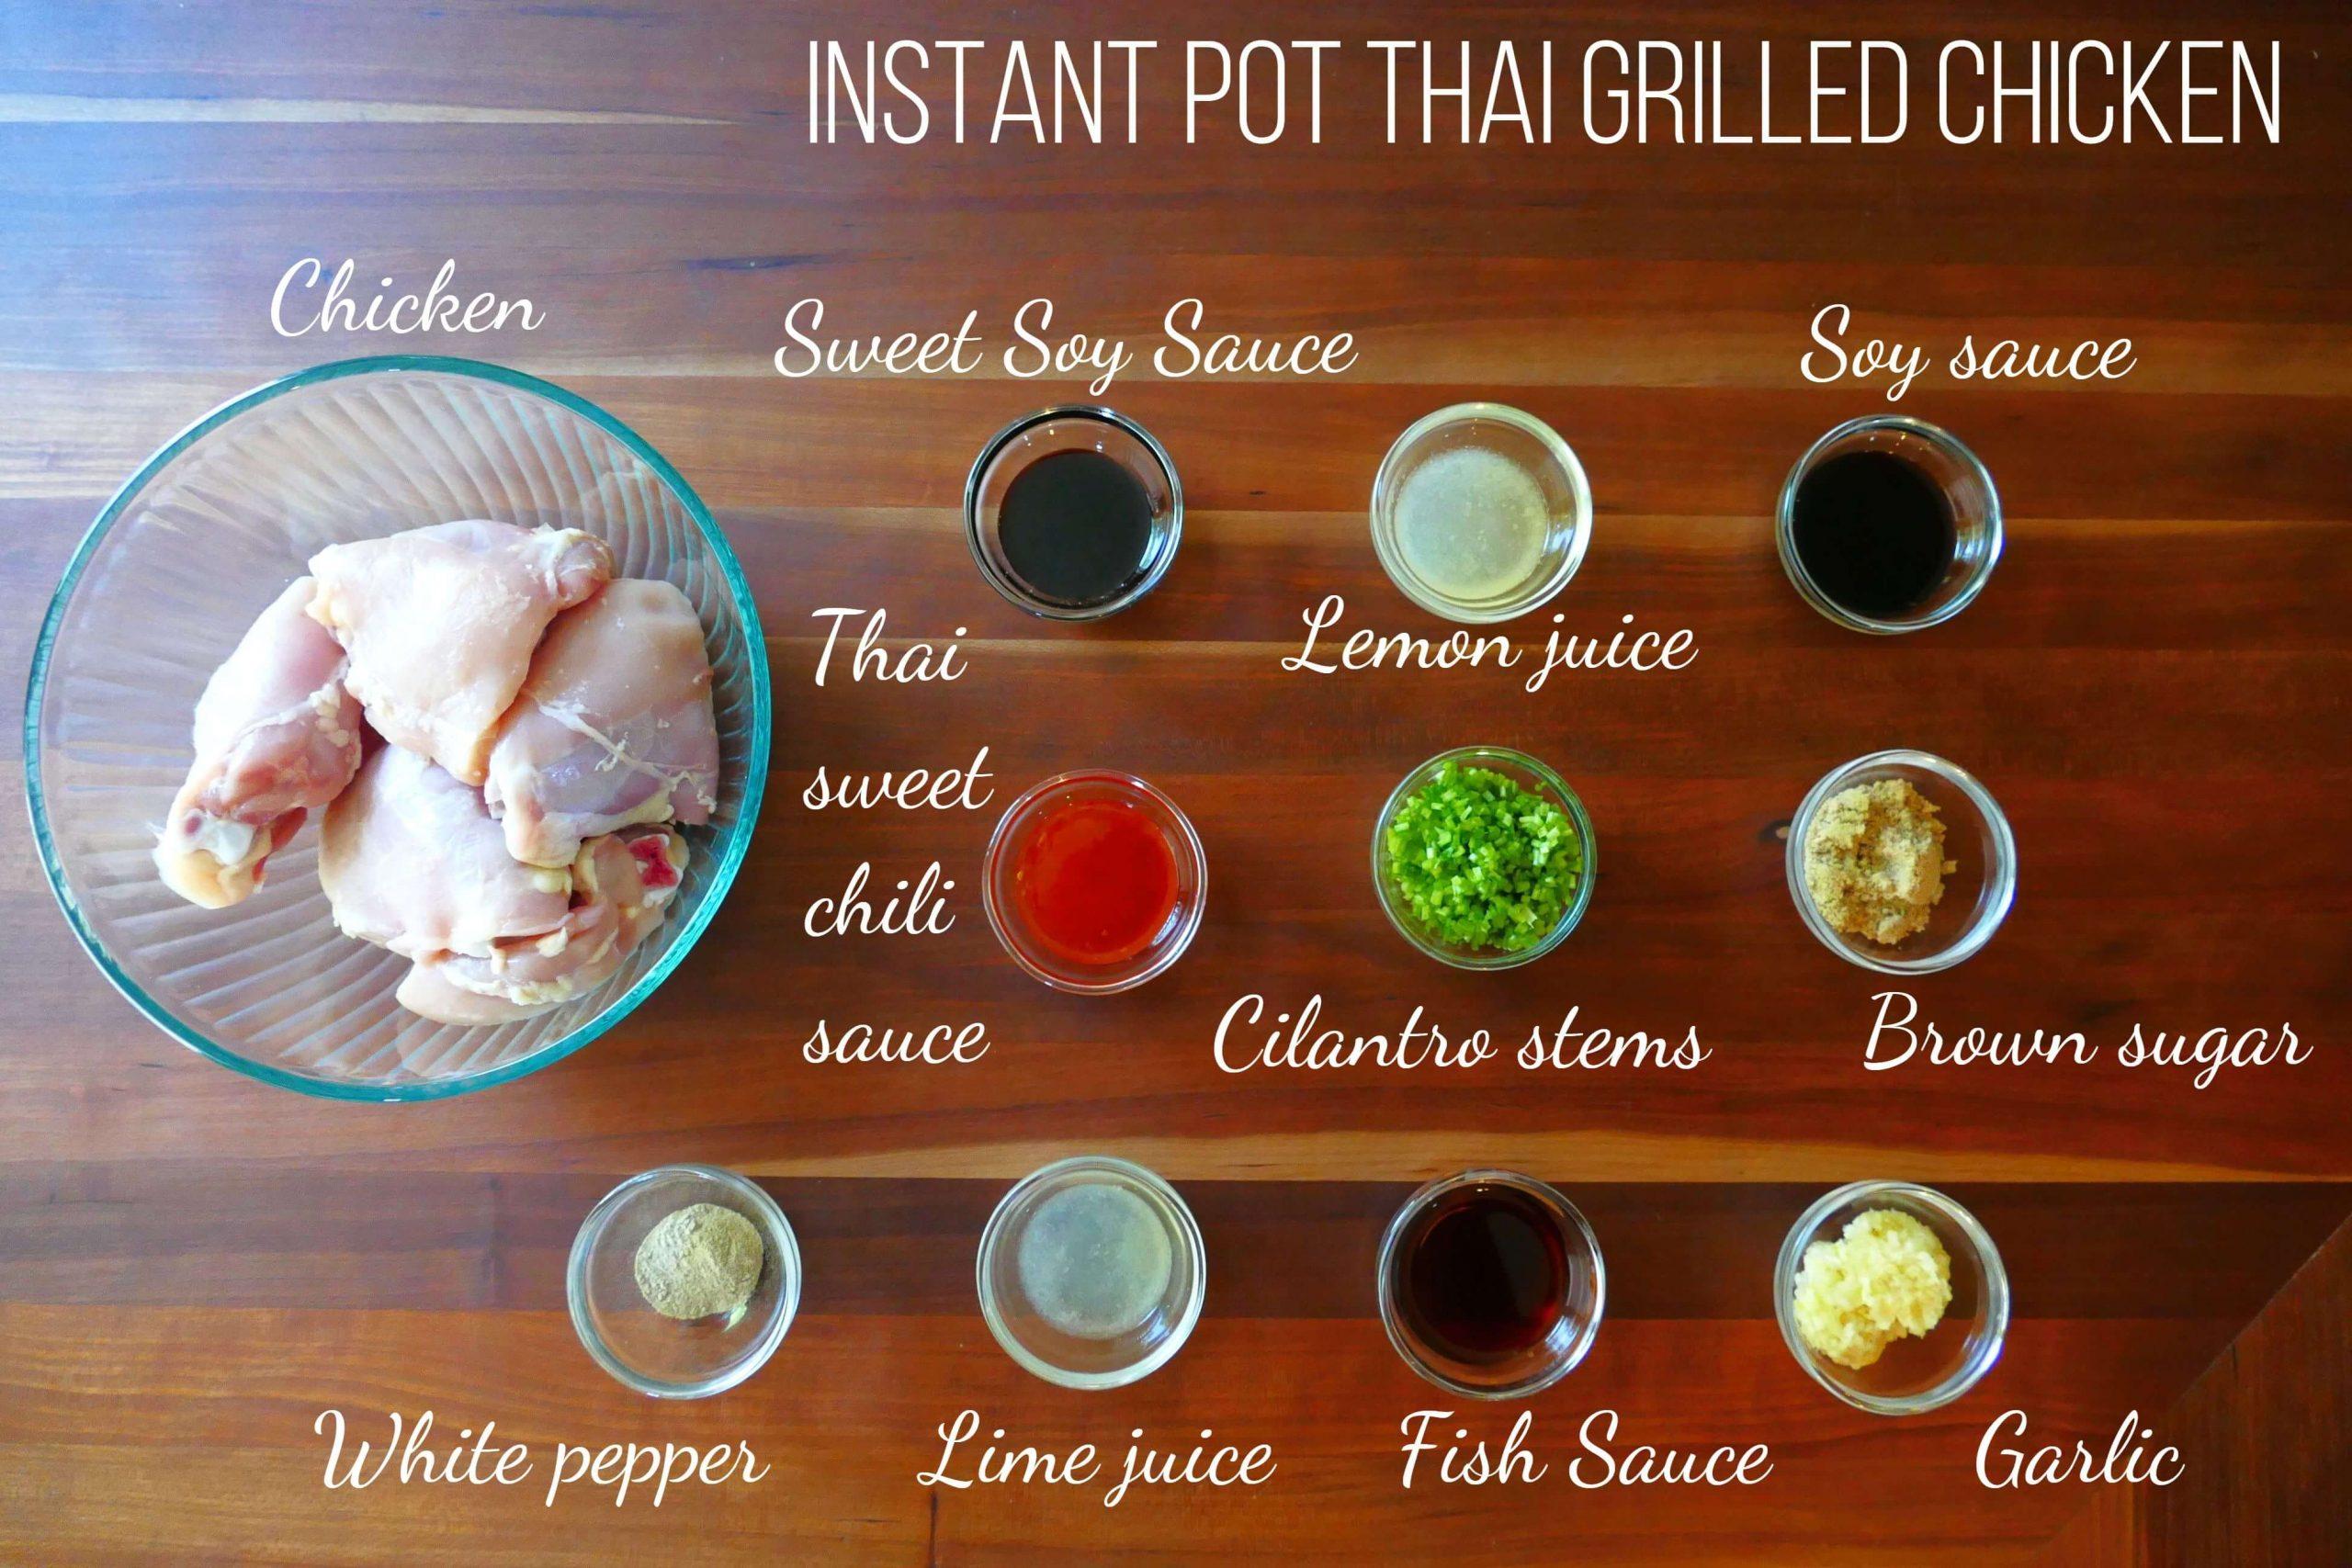 Instant Pot Thai Grilled Chicken Ingredient List - chicken, sweet soy sauce, lemon juice, soy sauce, thai sweet chili sauce, cilantro stems, brown sugar, white pepper, lime juice, fish sauce, garlic